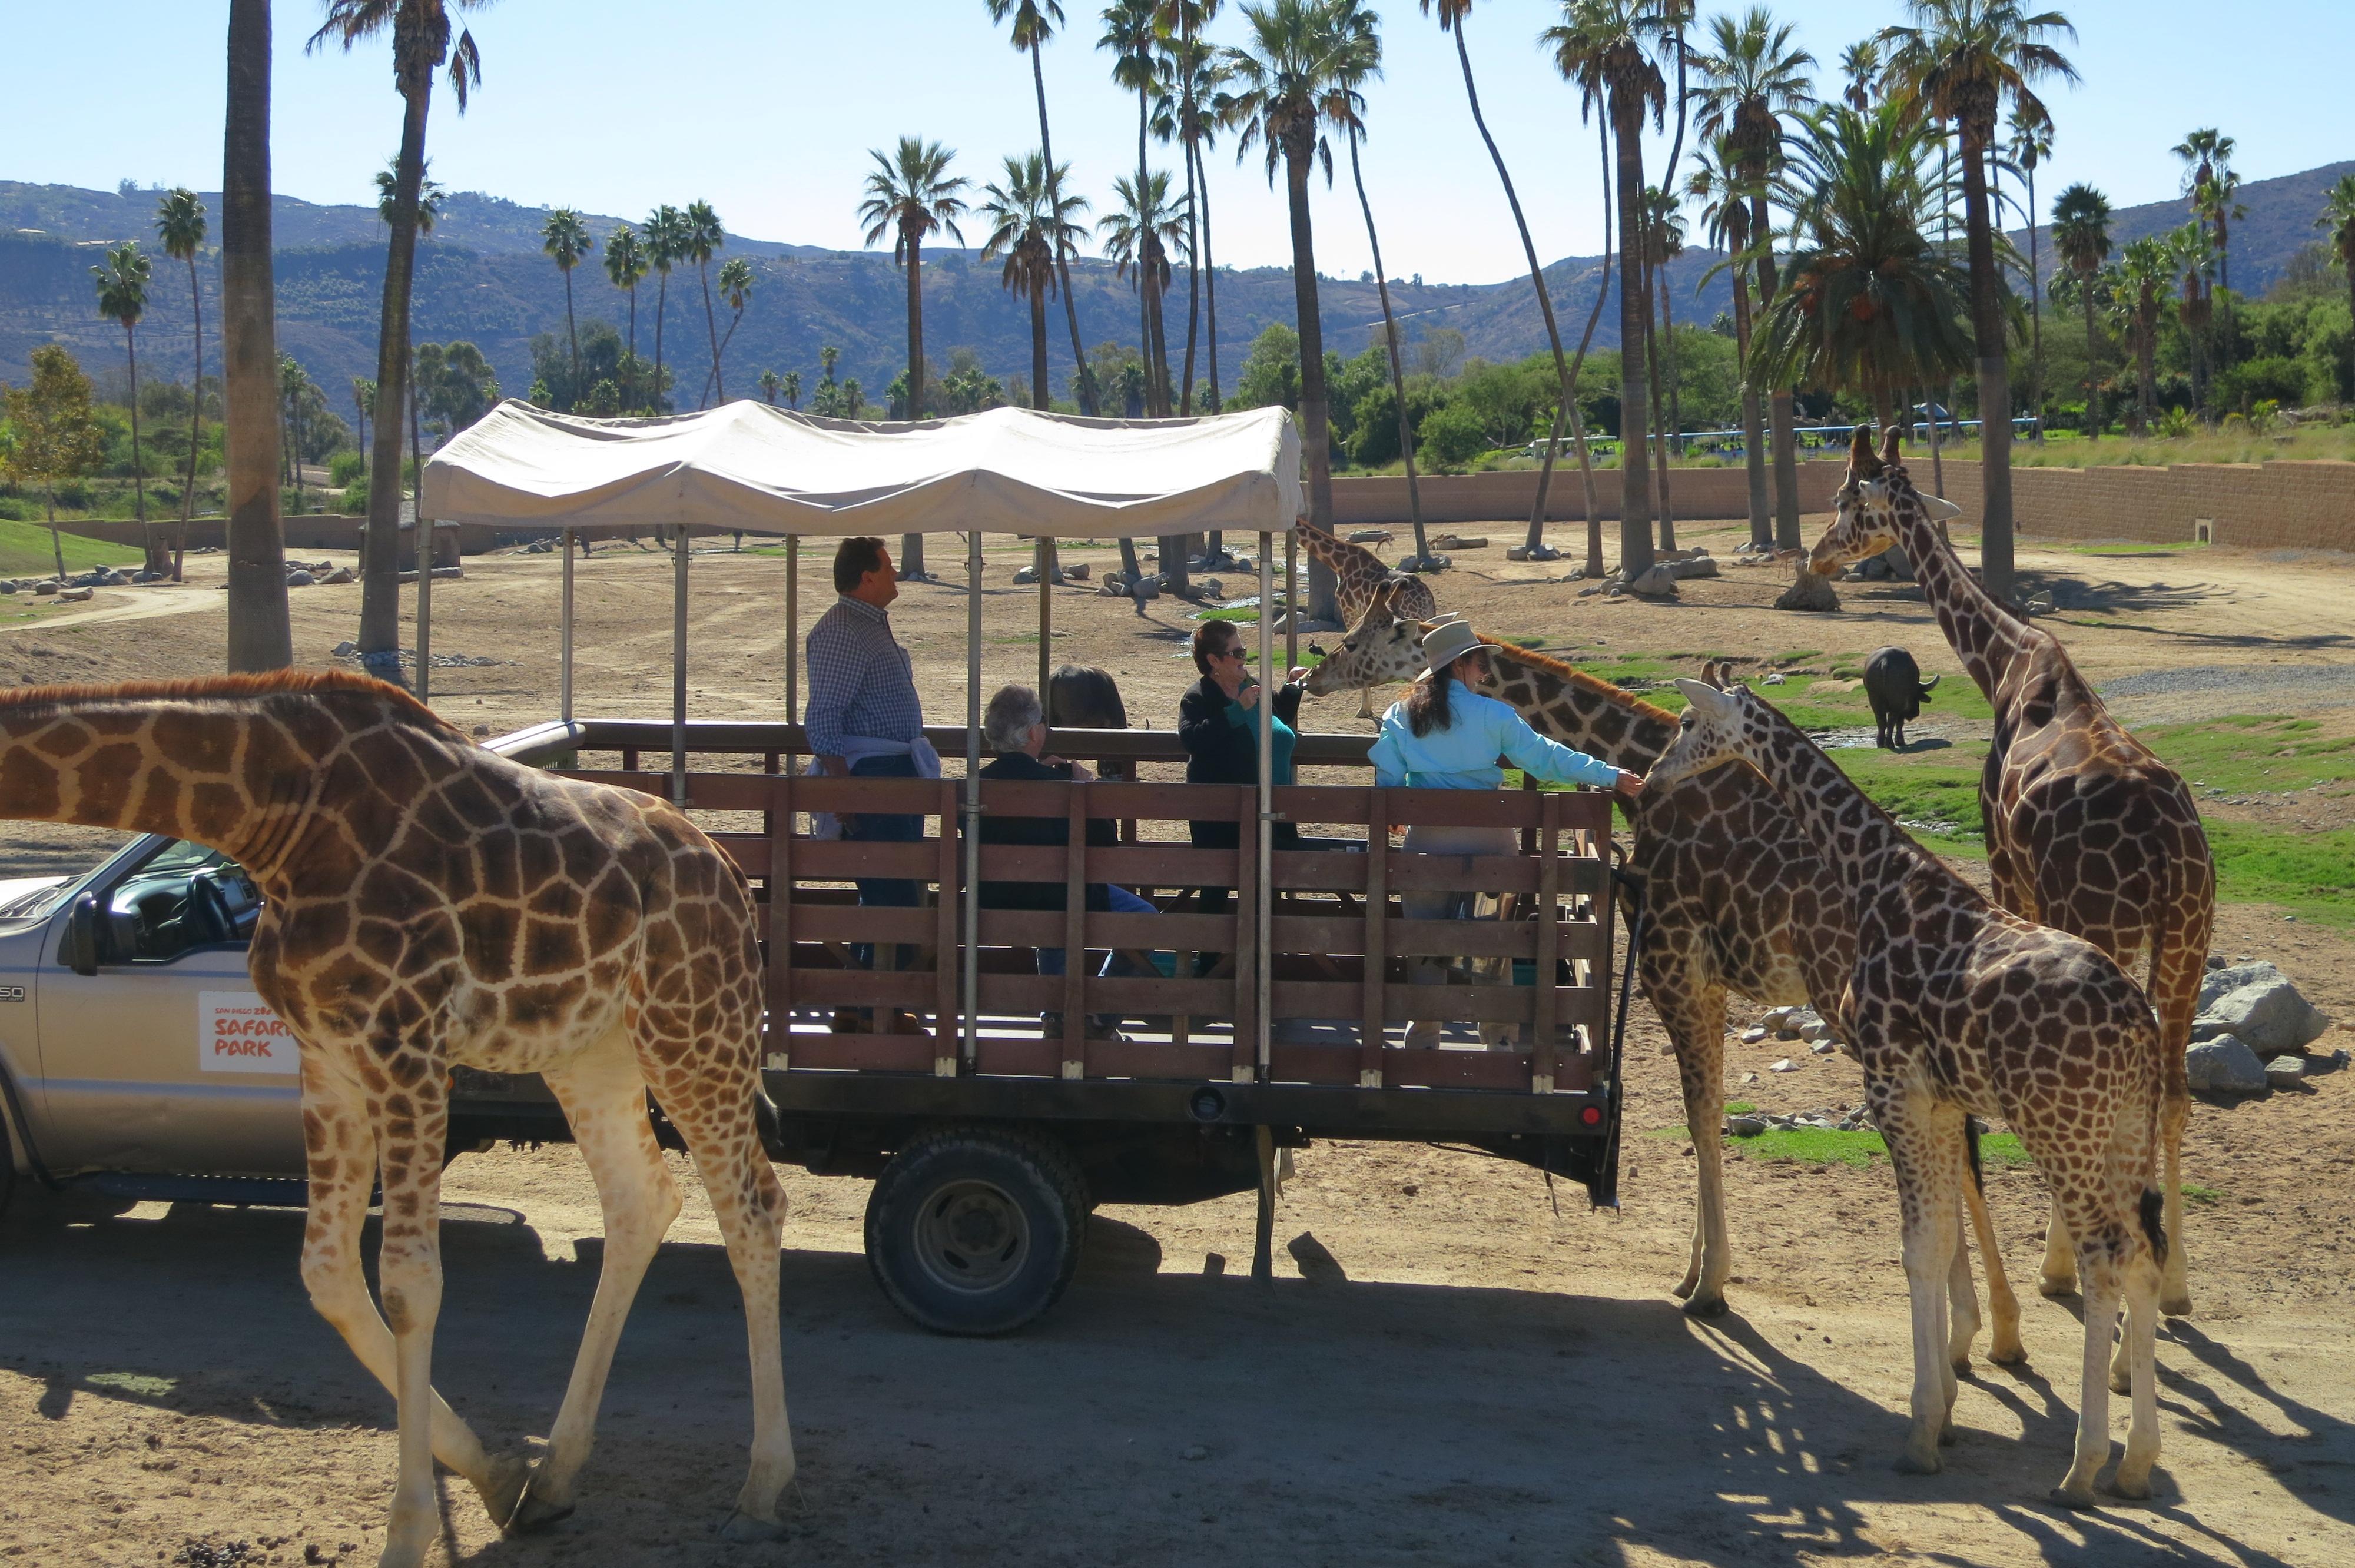 Behind The Scenes On A Caravan Safari At San Diego Zoo Safari Park